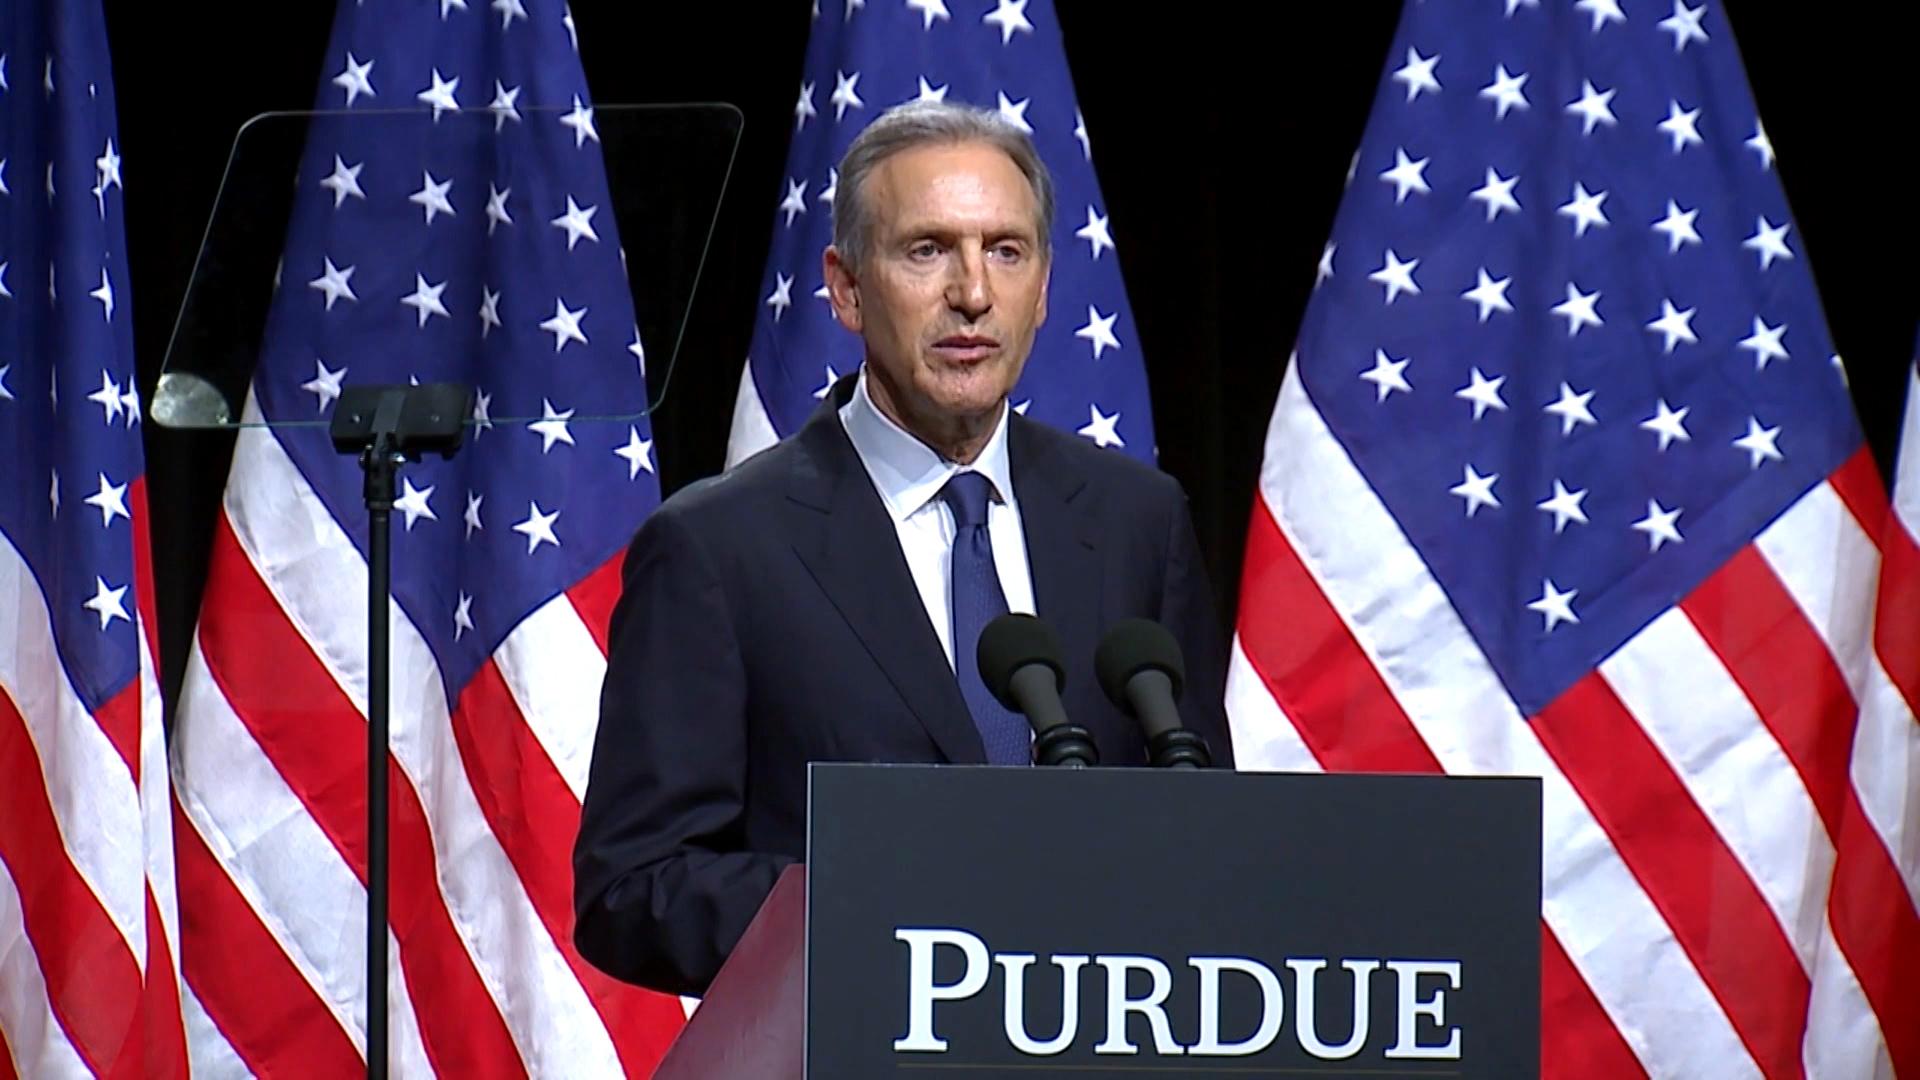 Ex-Starbucks CEO Howard Schultz ends independent bid for president